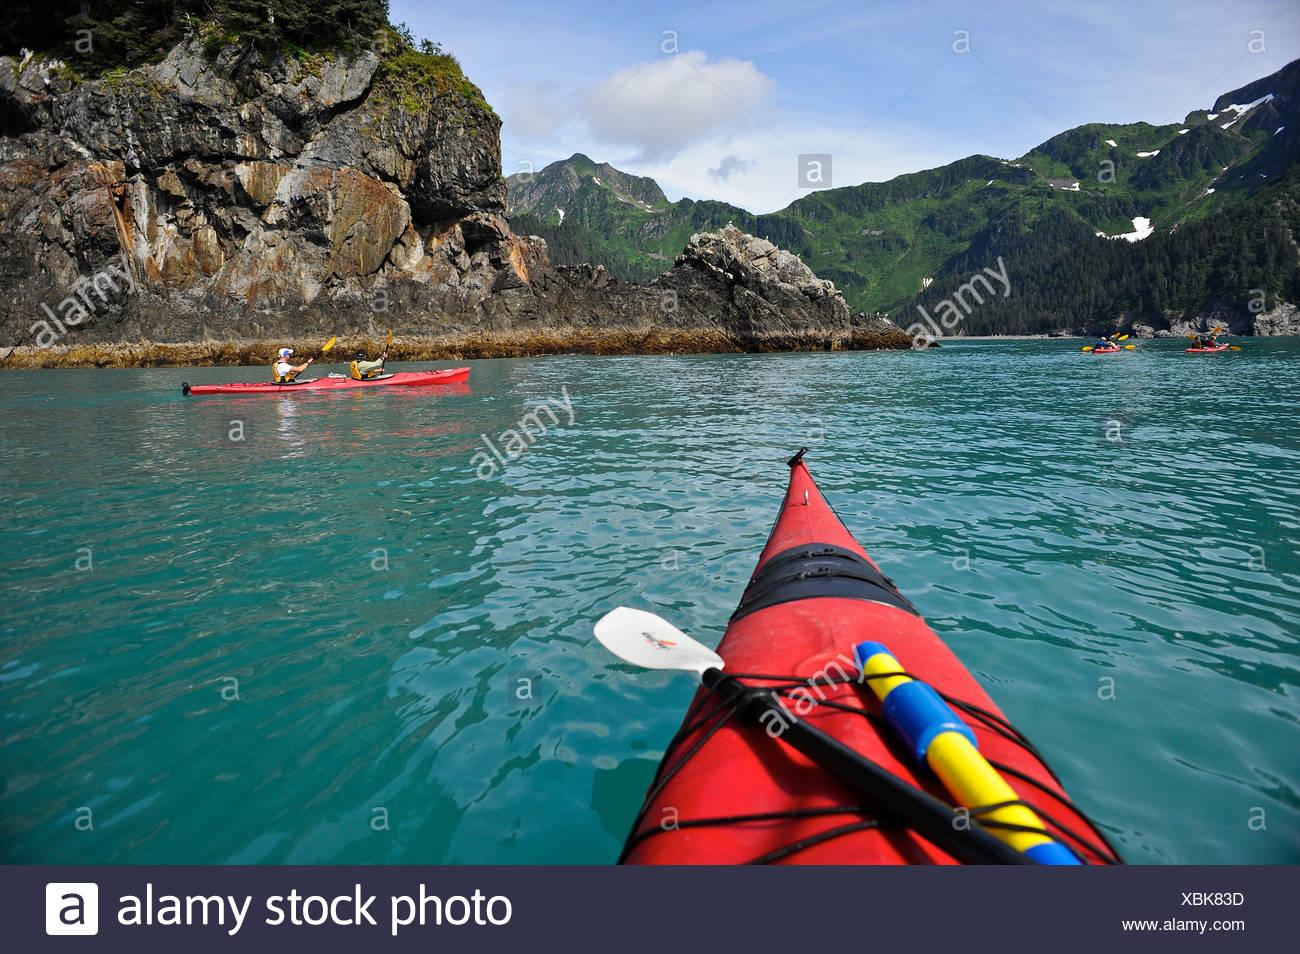 Visitors enjoy a day of kayak touring near Bulldog Cove in Kenai Fjords National Park, Alaska - Stock Image